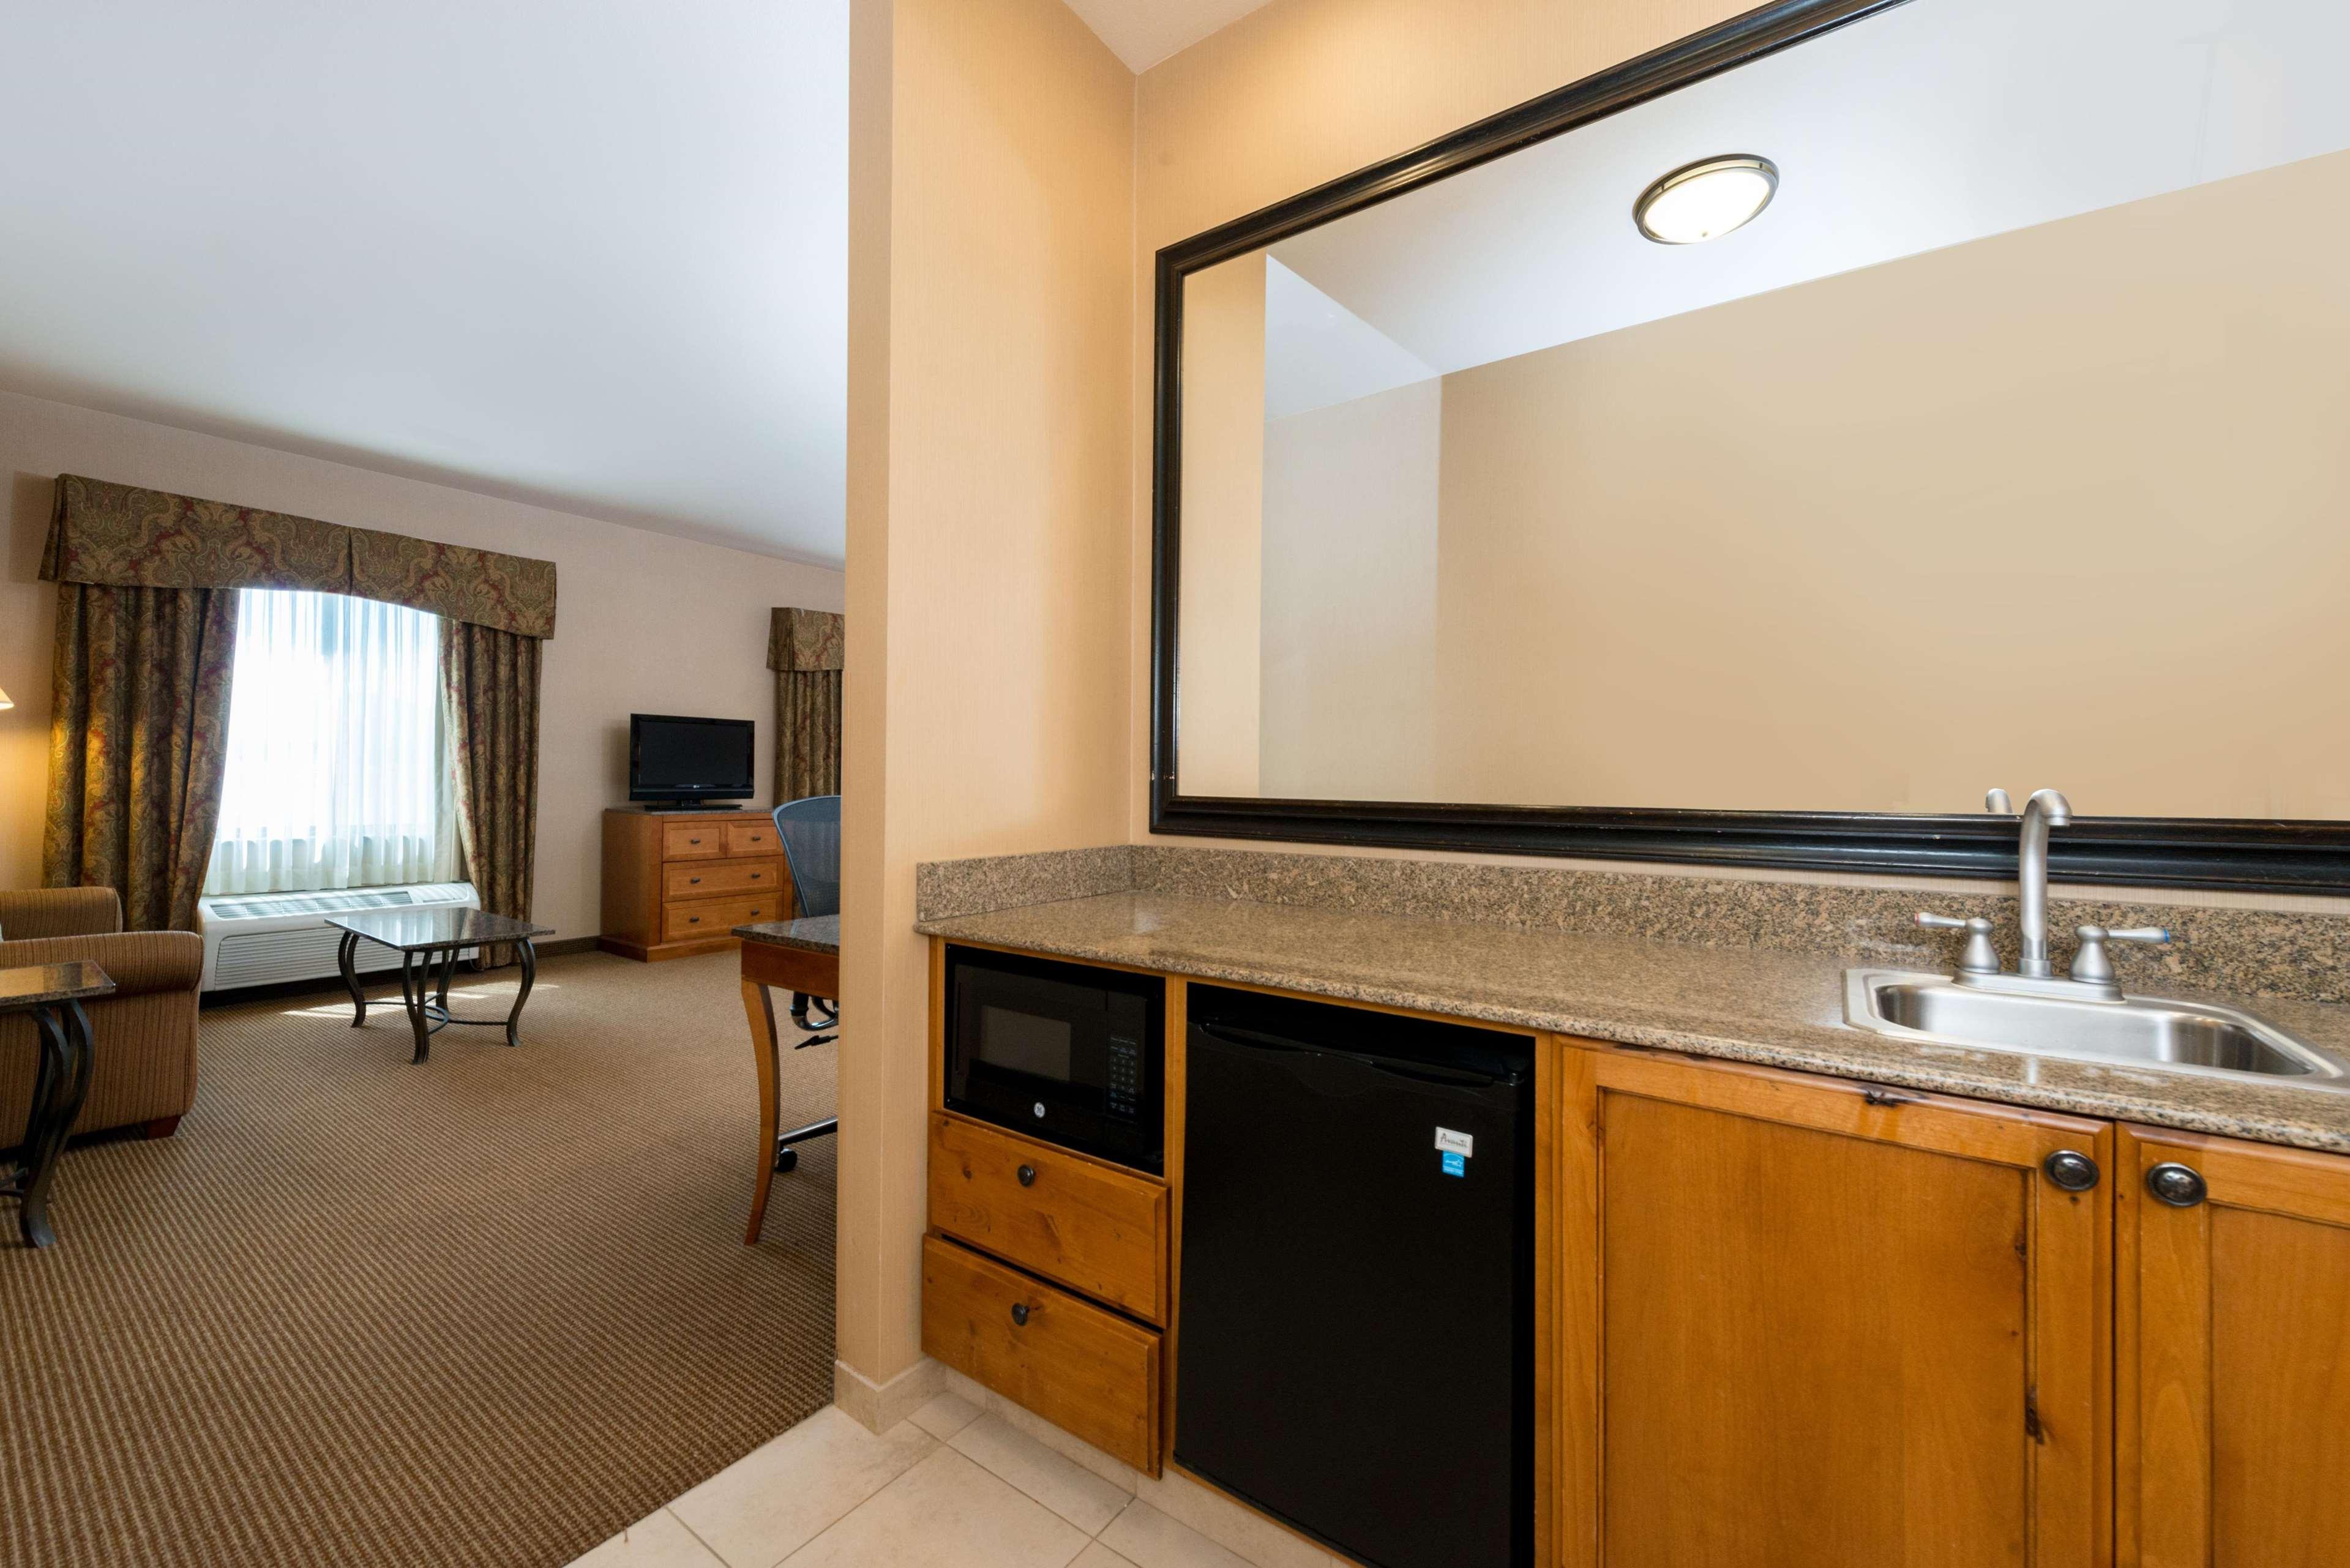 Hampton Inn & Suites Salt Lake City-West Jordan image 31